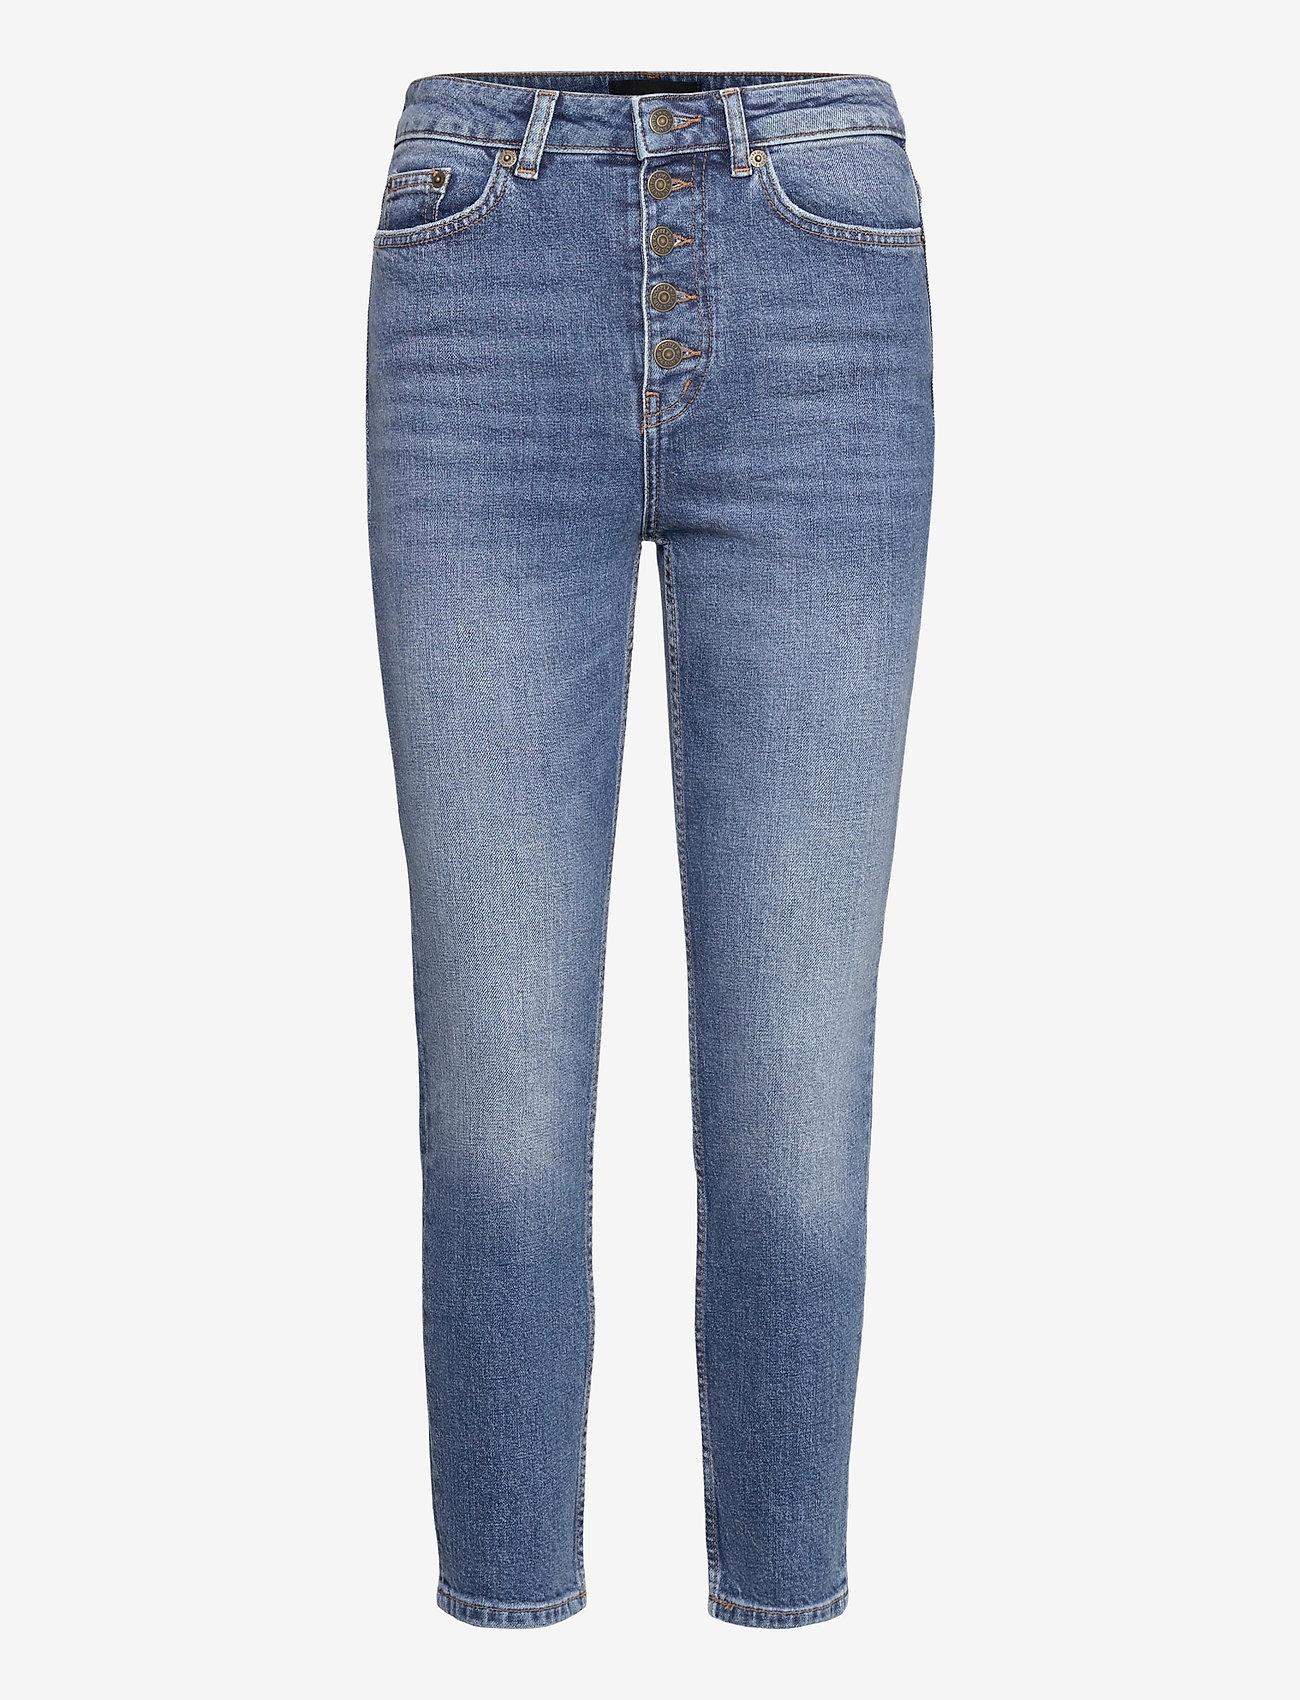 The Kooples - JEANS - slim jeans - blue - 0